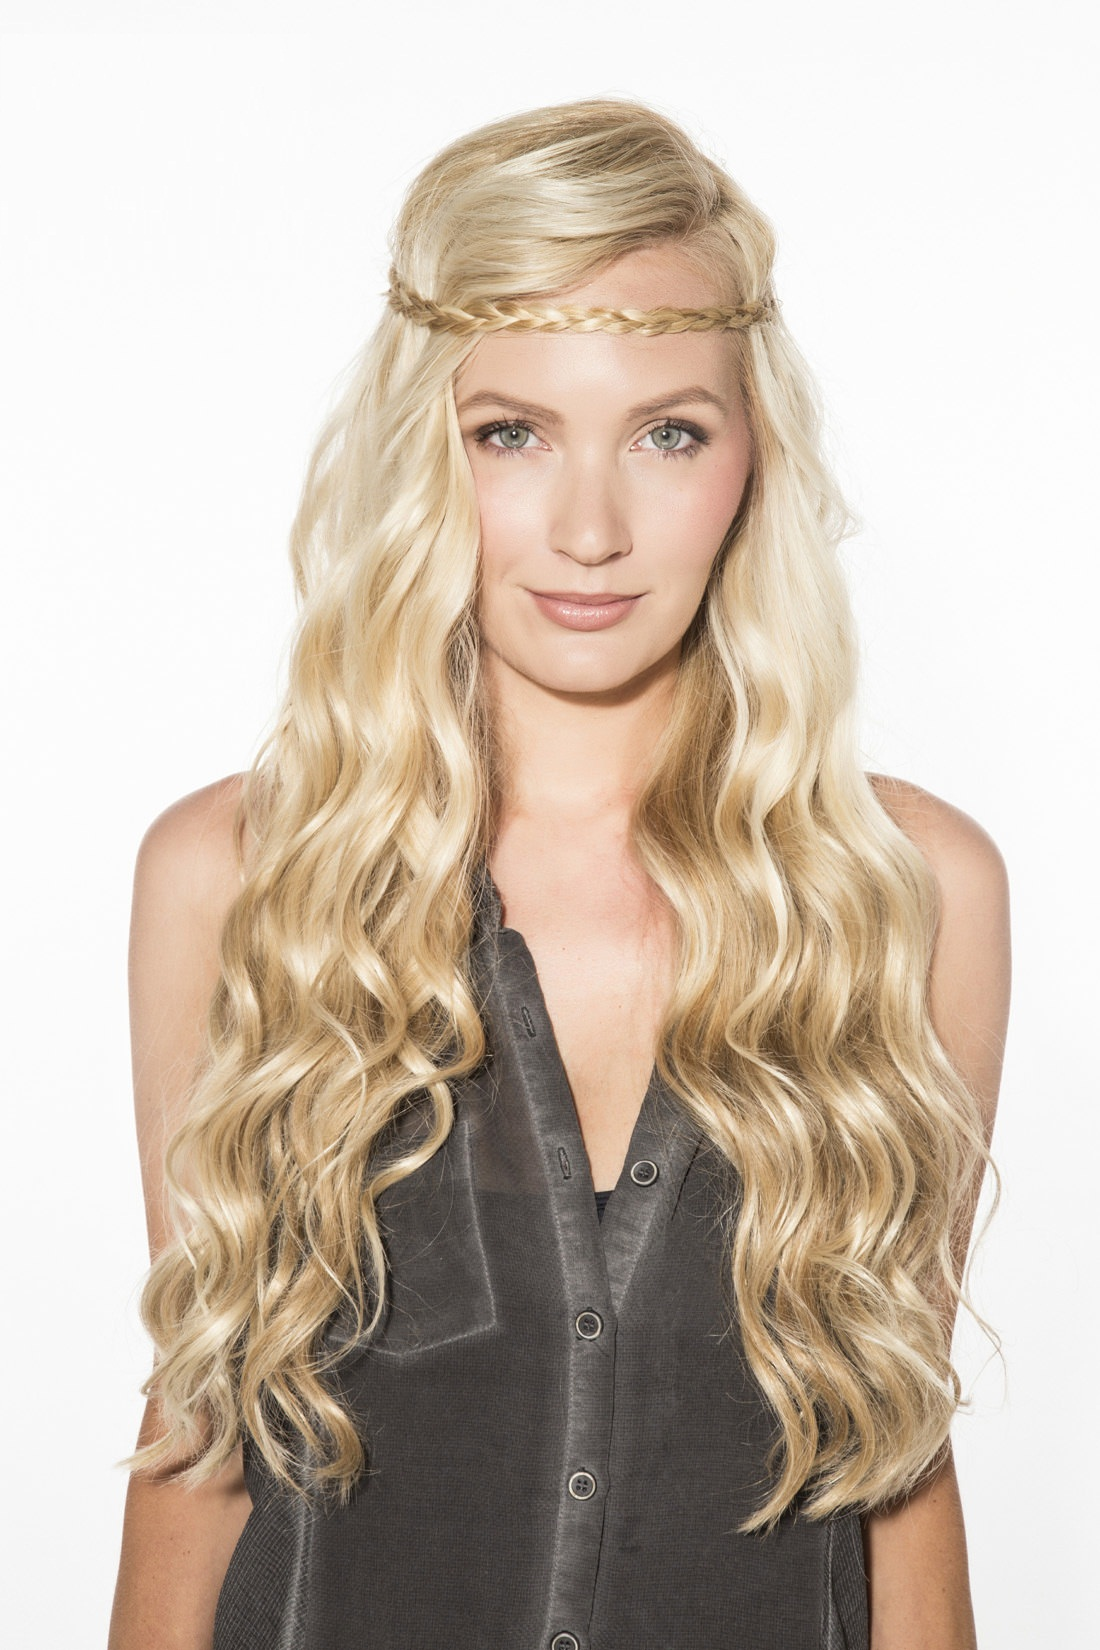 Hair Styles For Women Long Hair : styles, women, Hairstyles, HairStyles